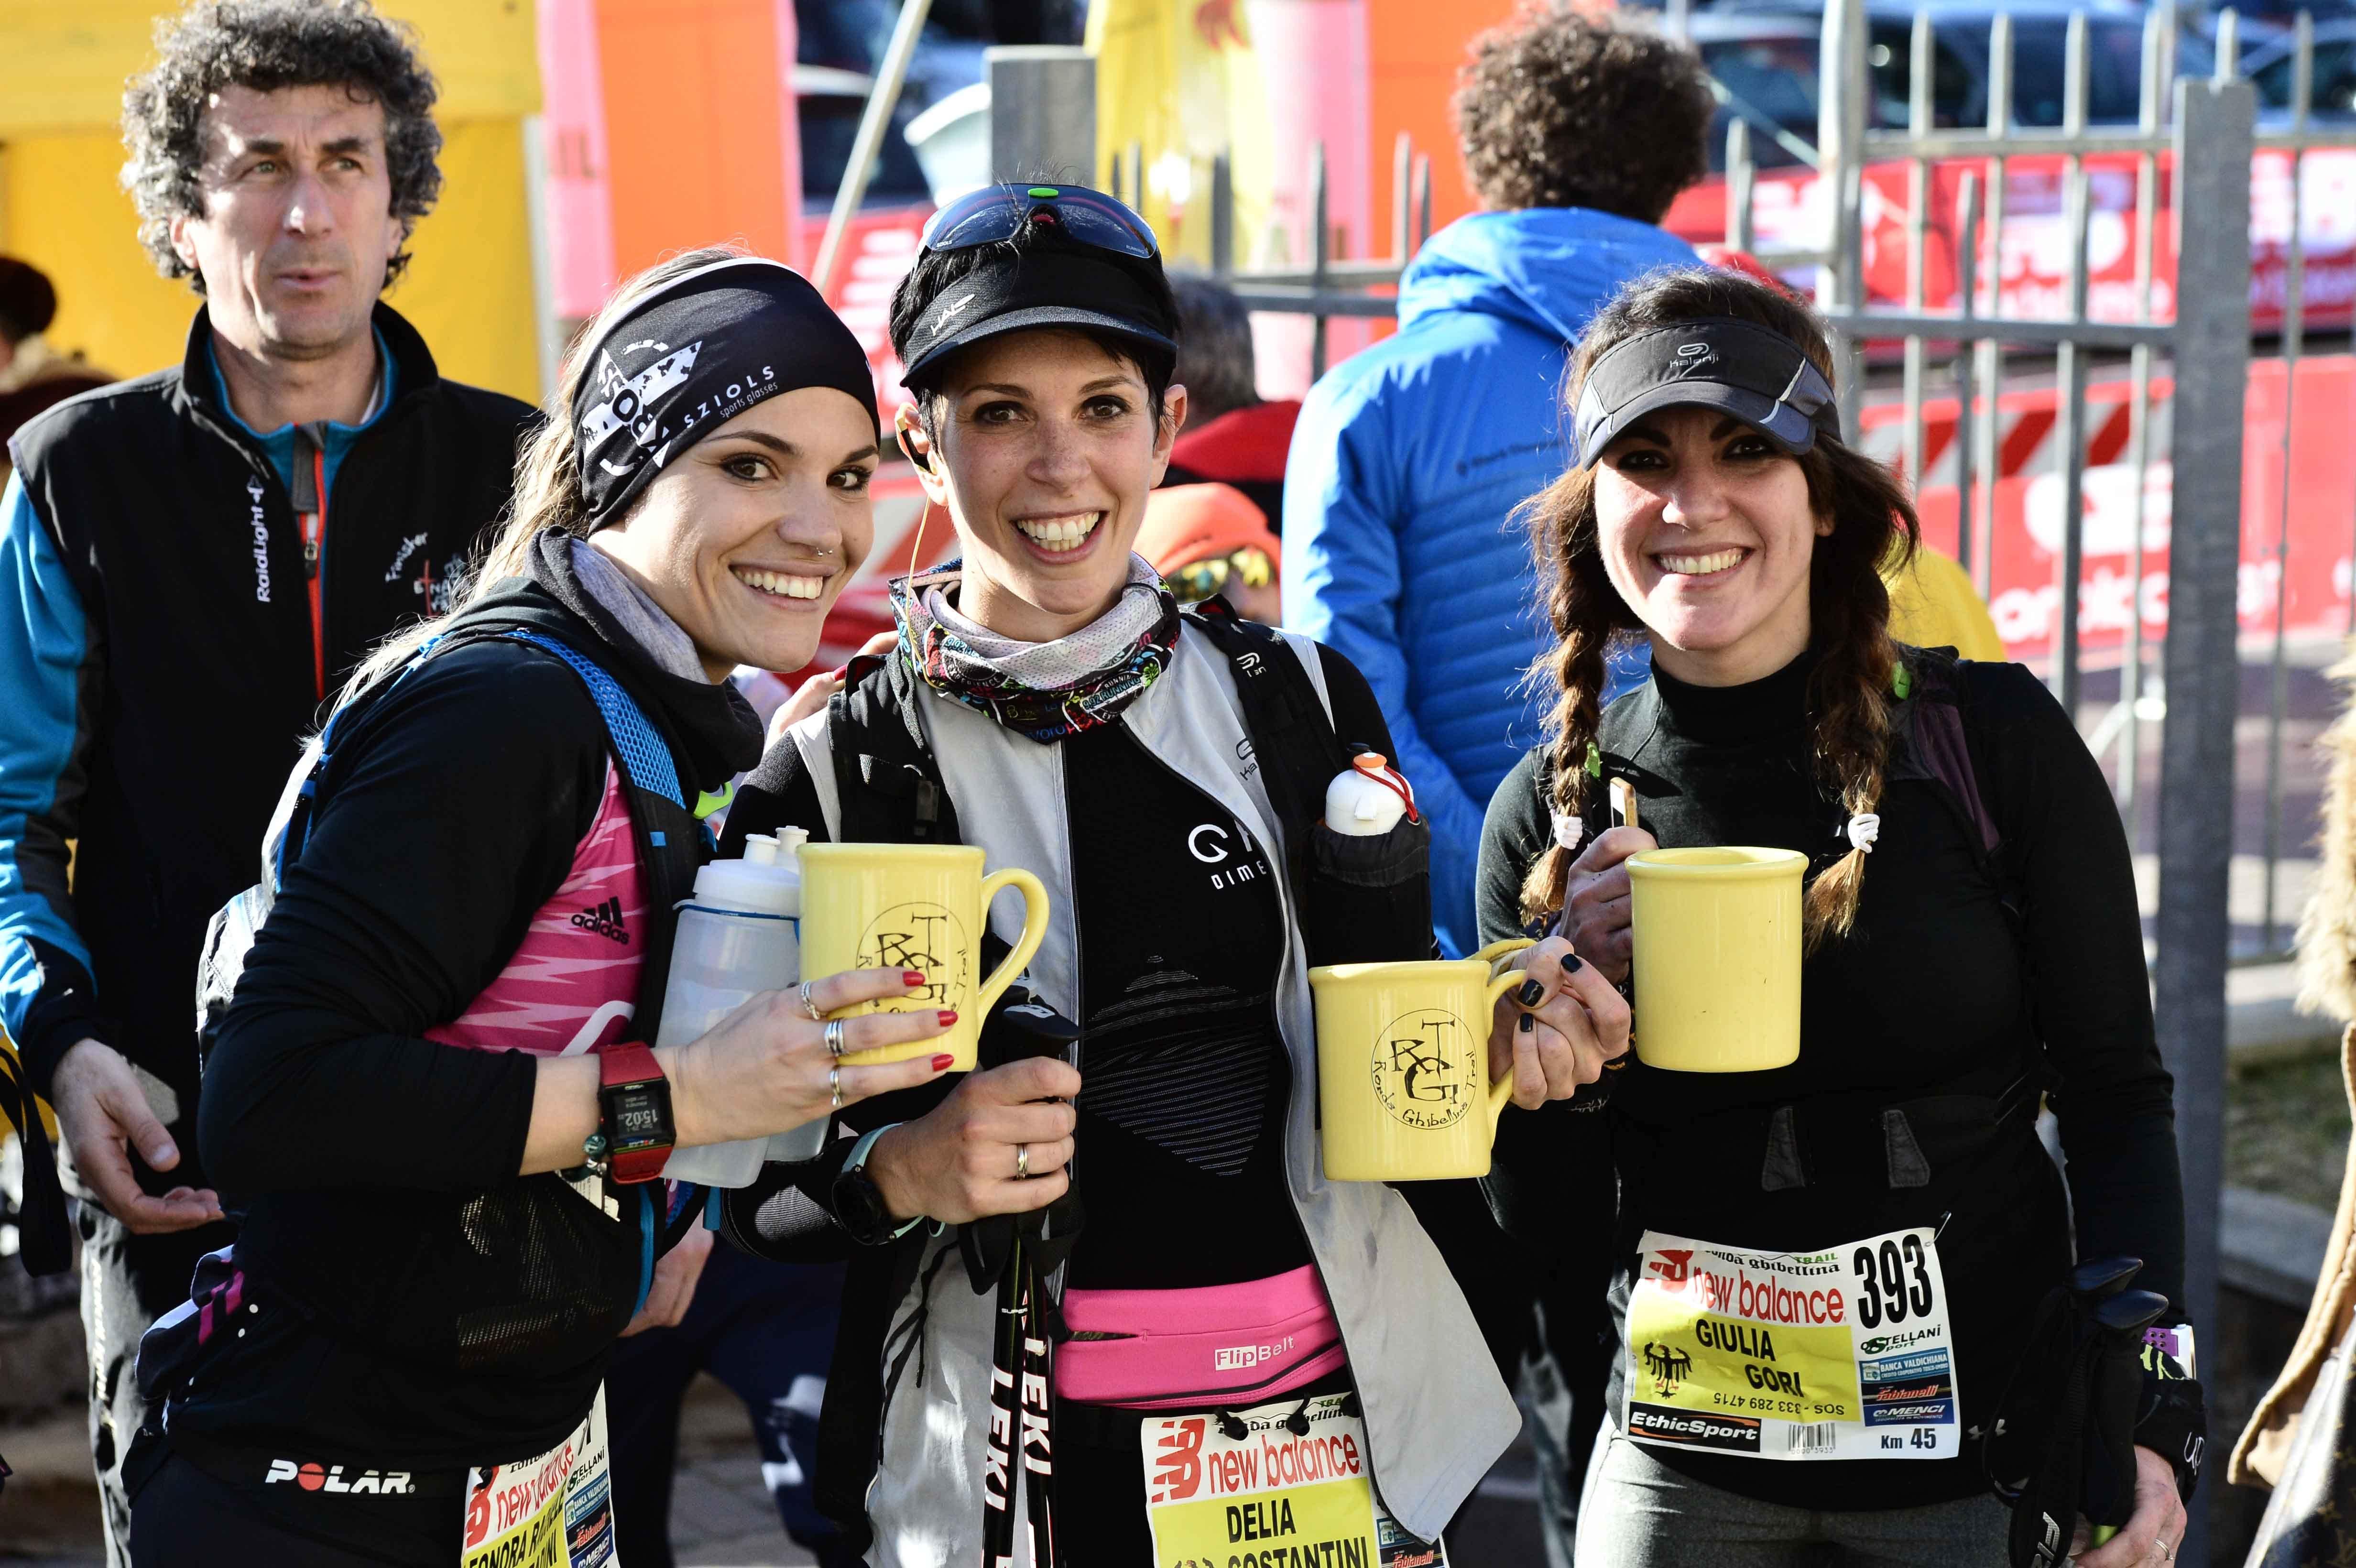 Arriva la Ronda Ghibellina Trail, attesi oltre 1100 atleti